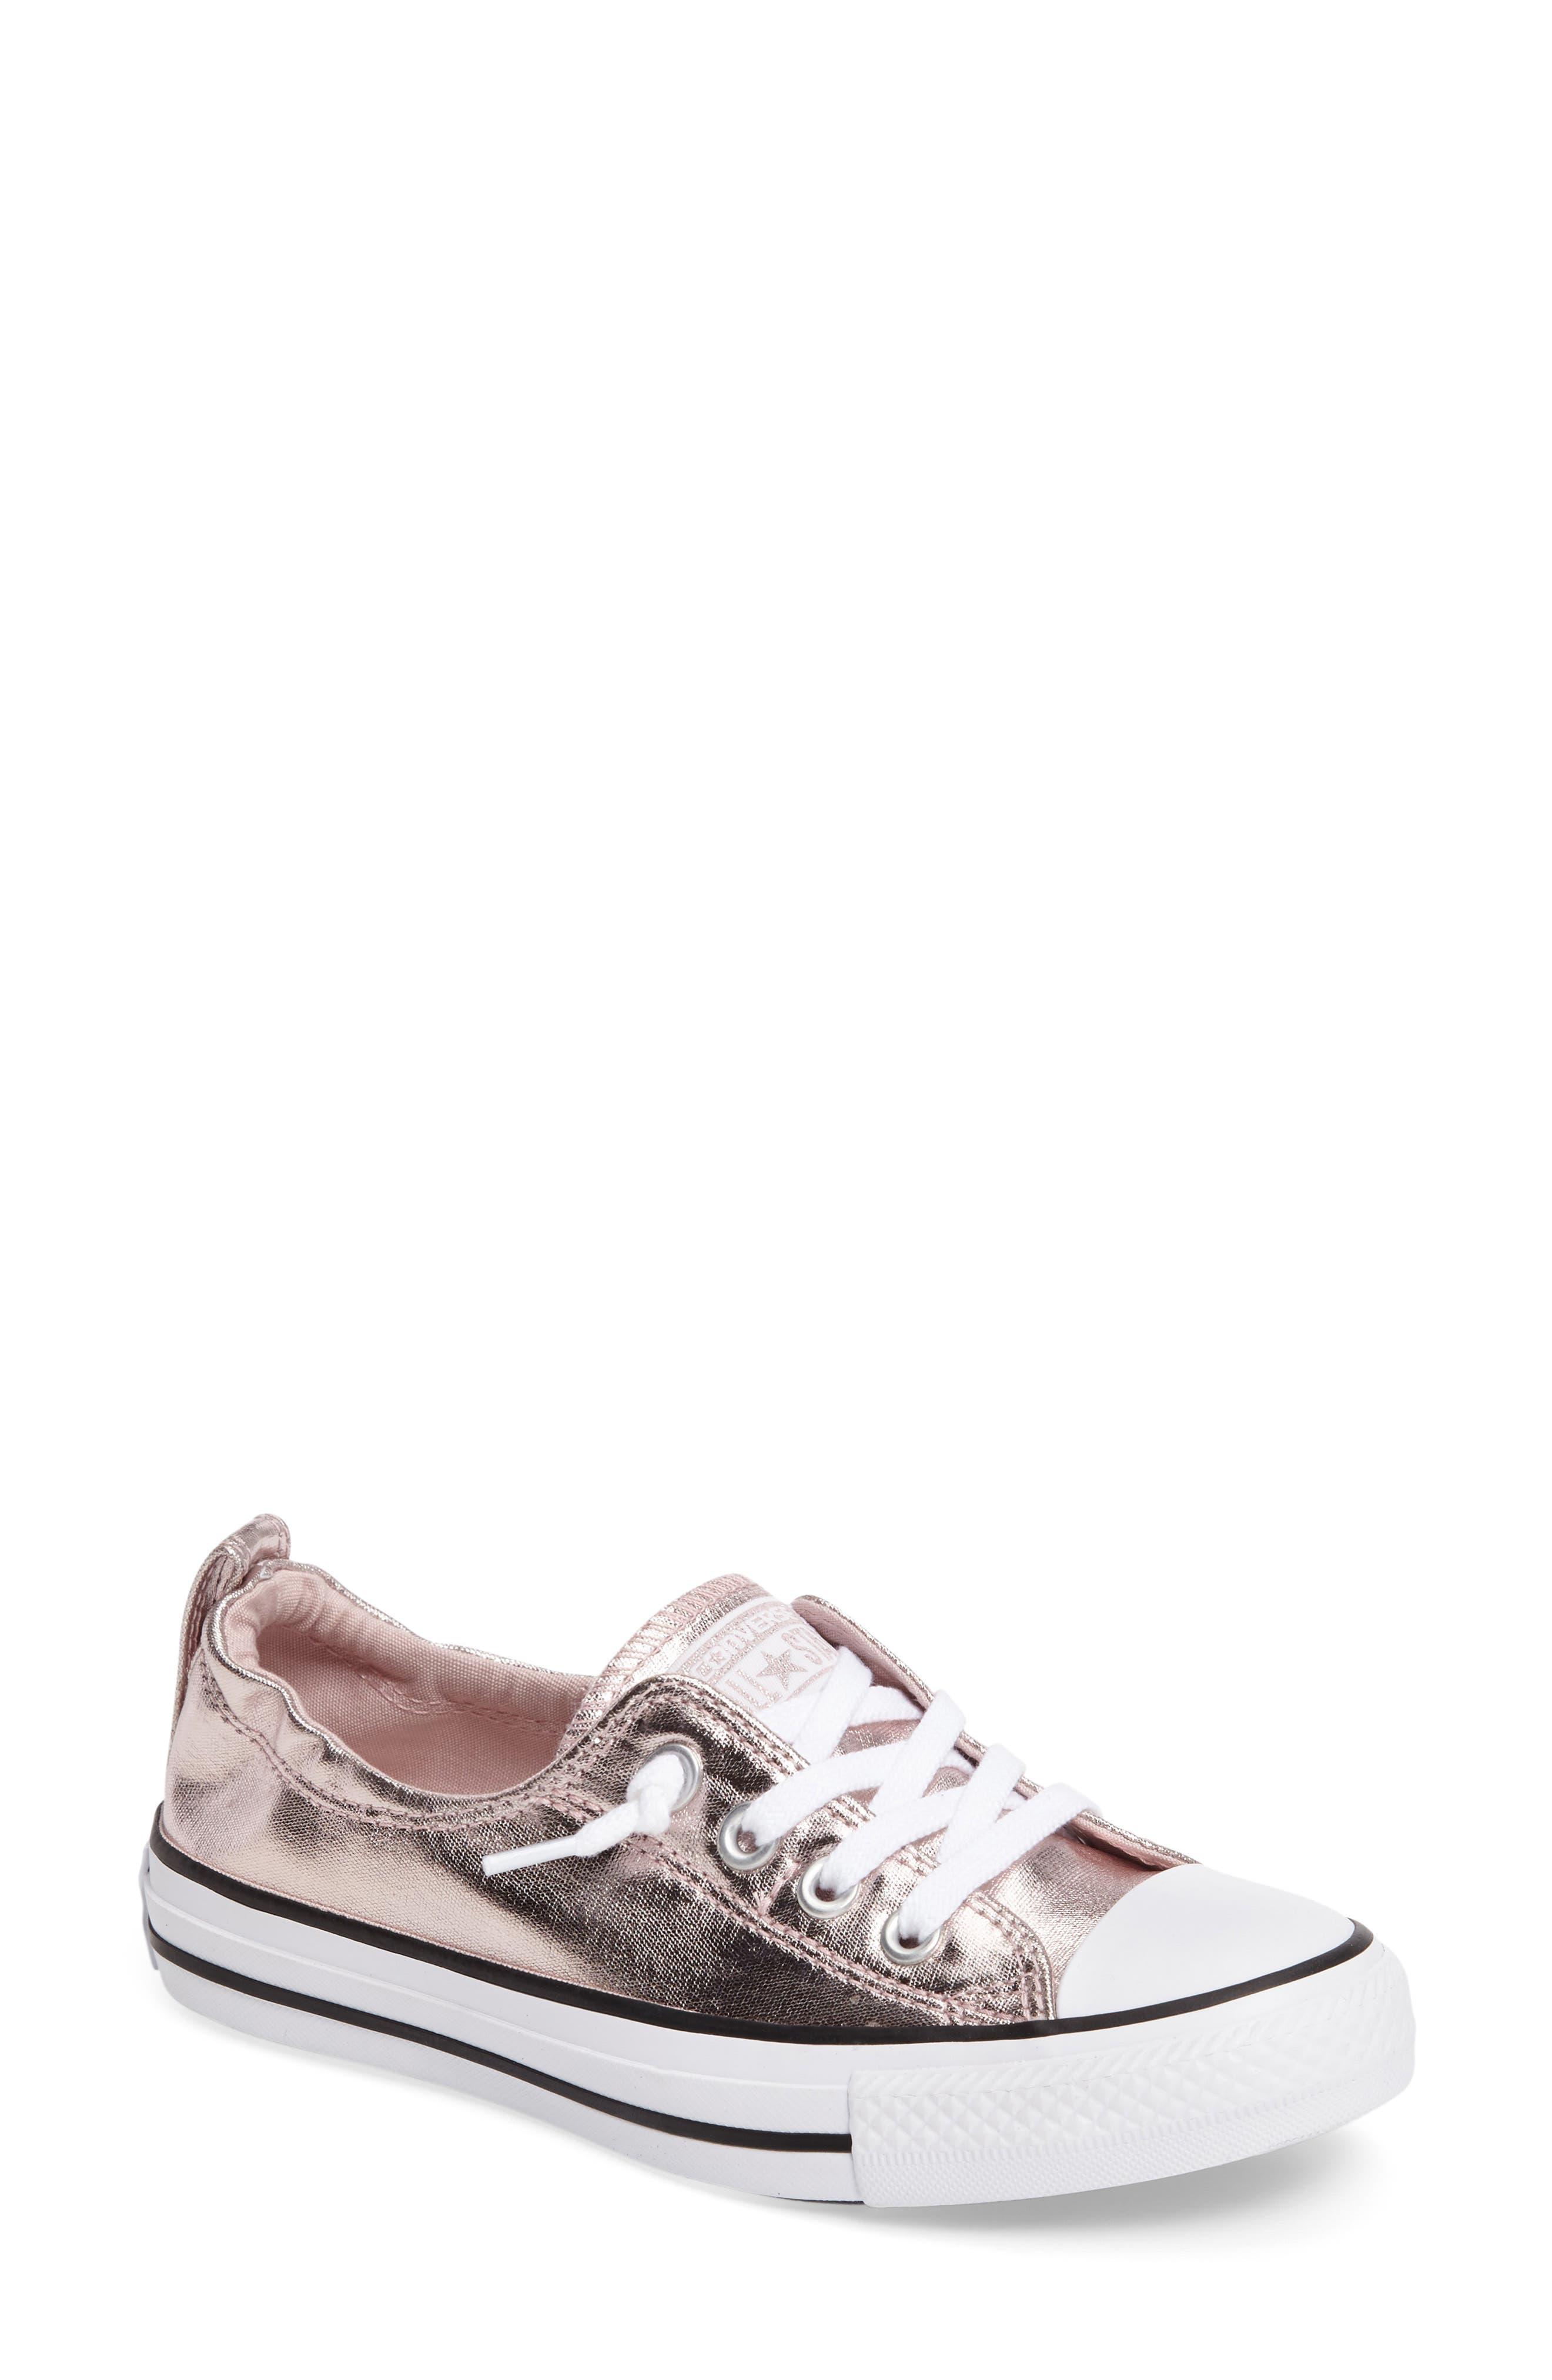 Main Image - Converse Chuck Taylor® All Star® Shoreline Low Top Sneaker (Women)